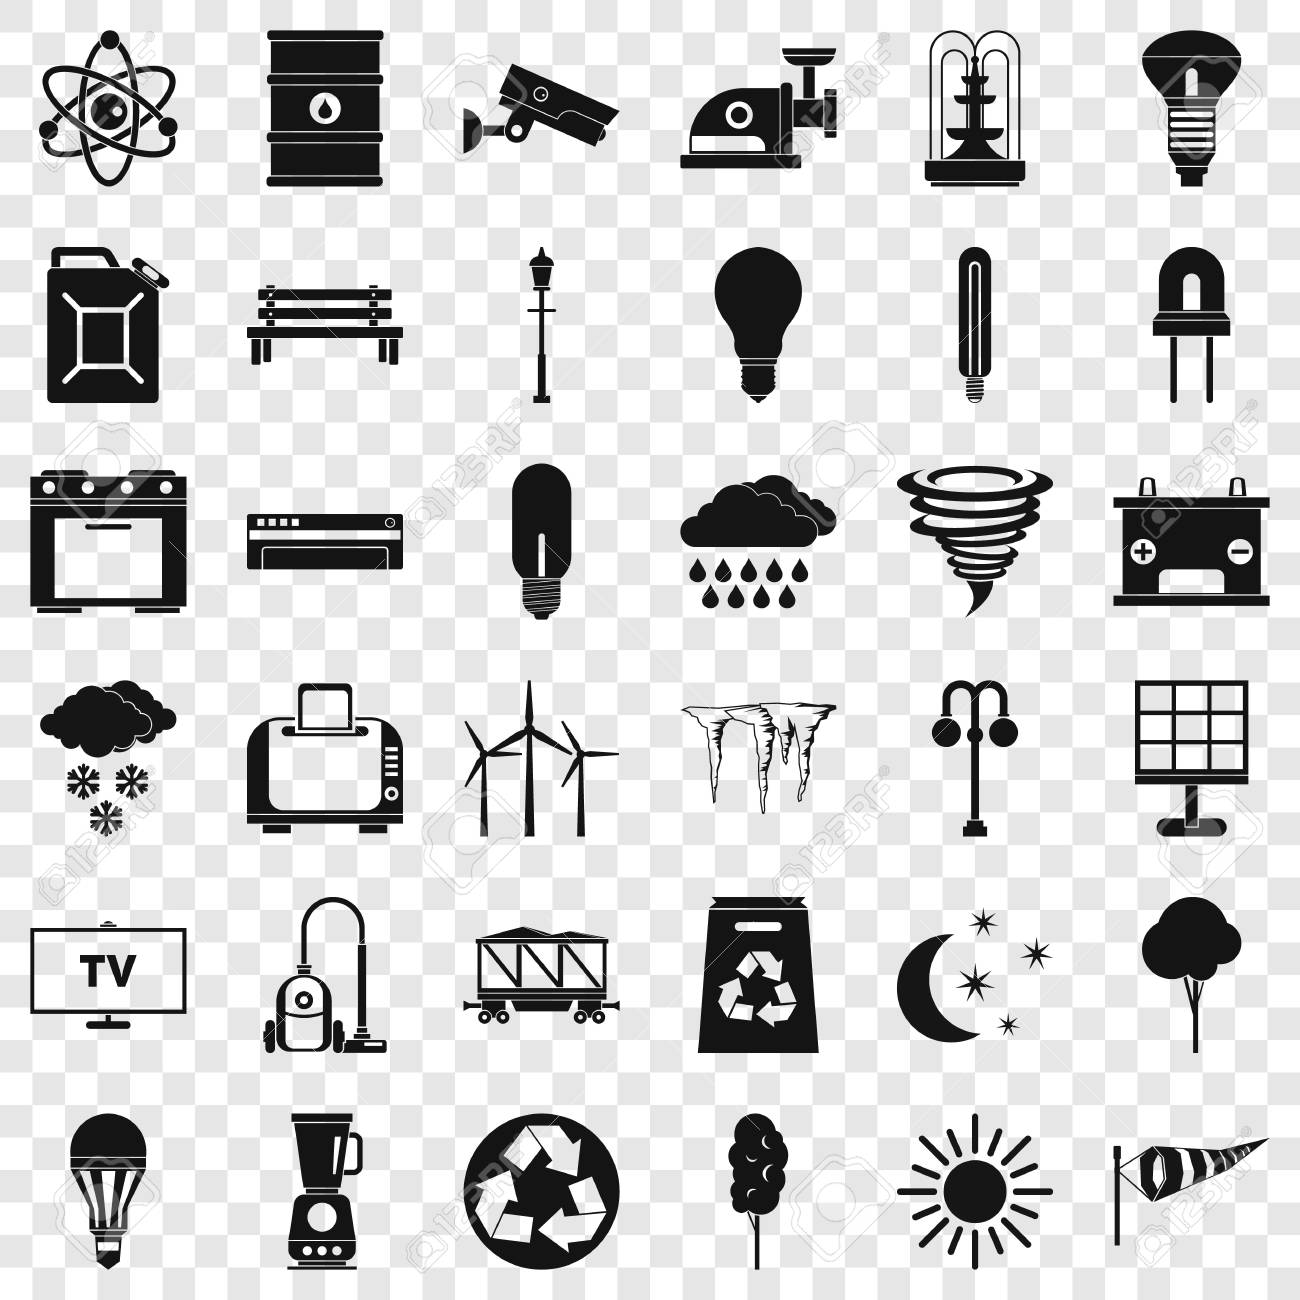 Windmill village icons set, simple style - 117116887